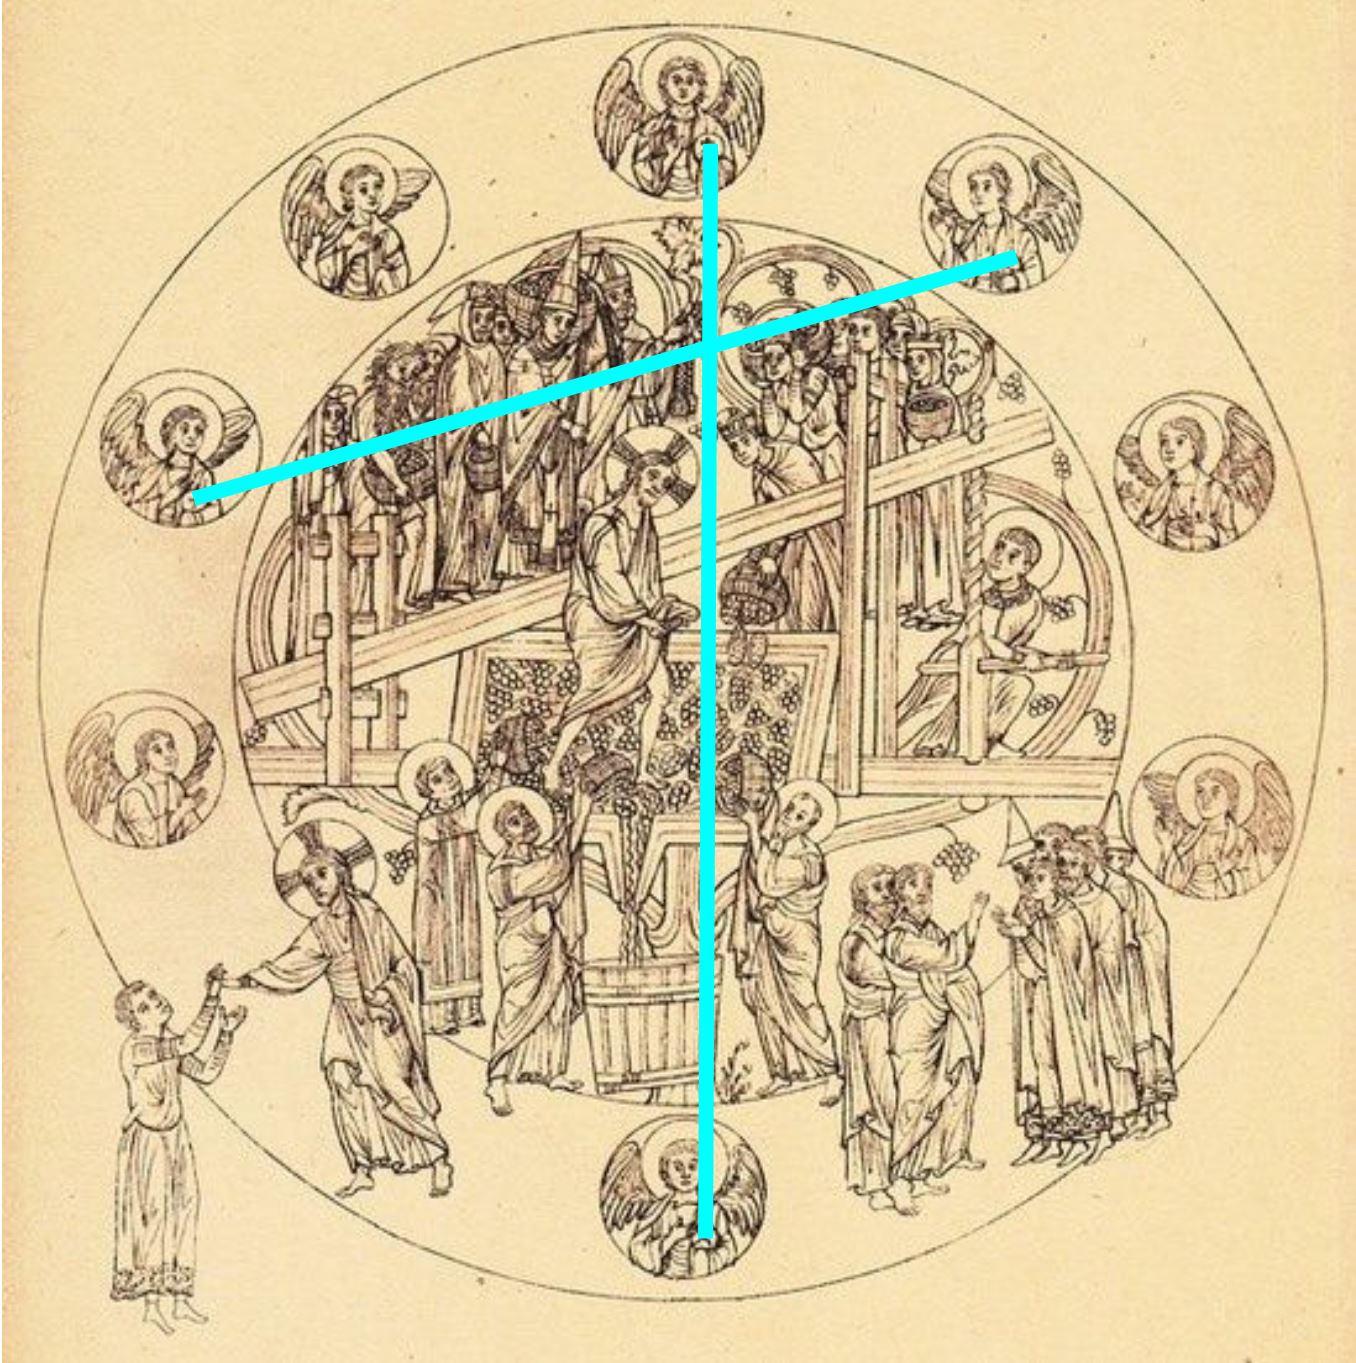 Hortus deliciarum le-pressoir-mystique schema